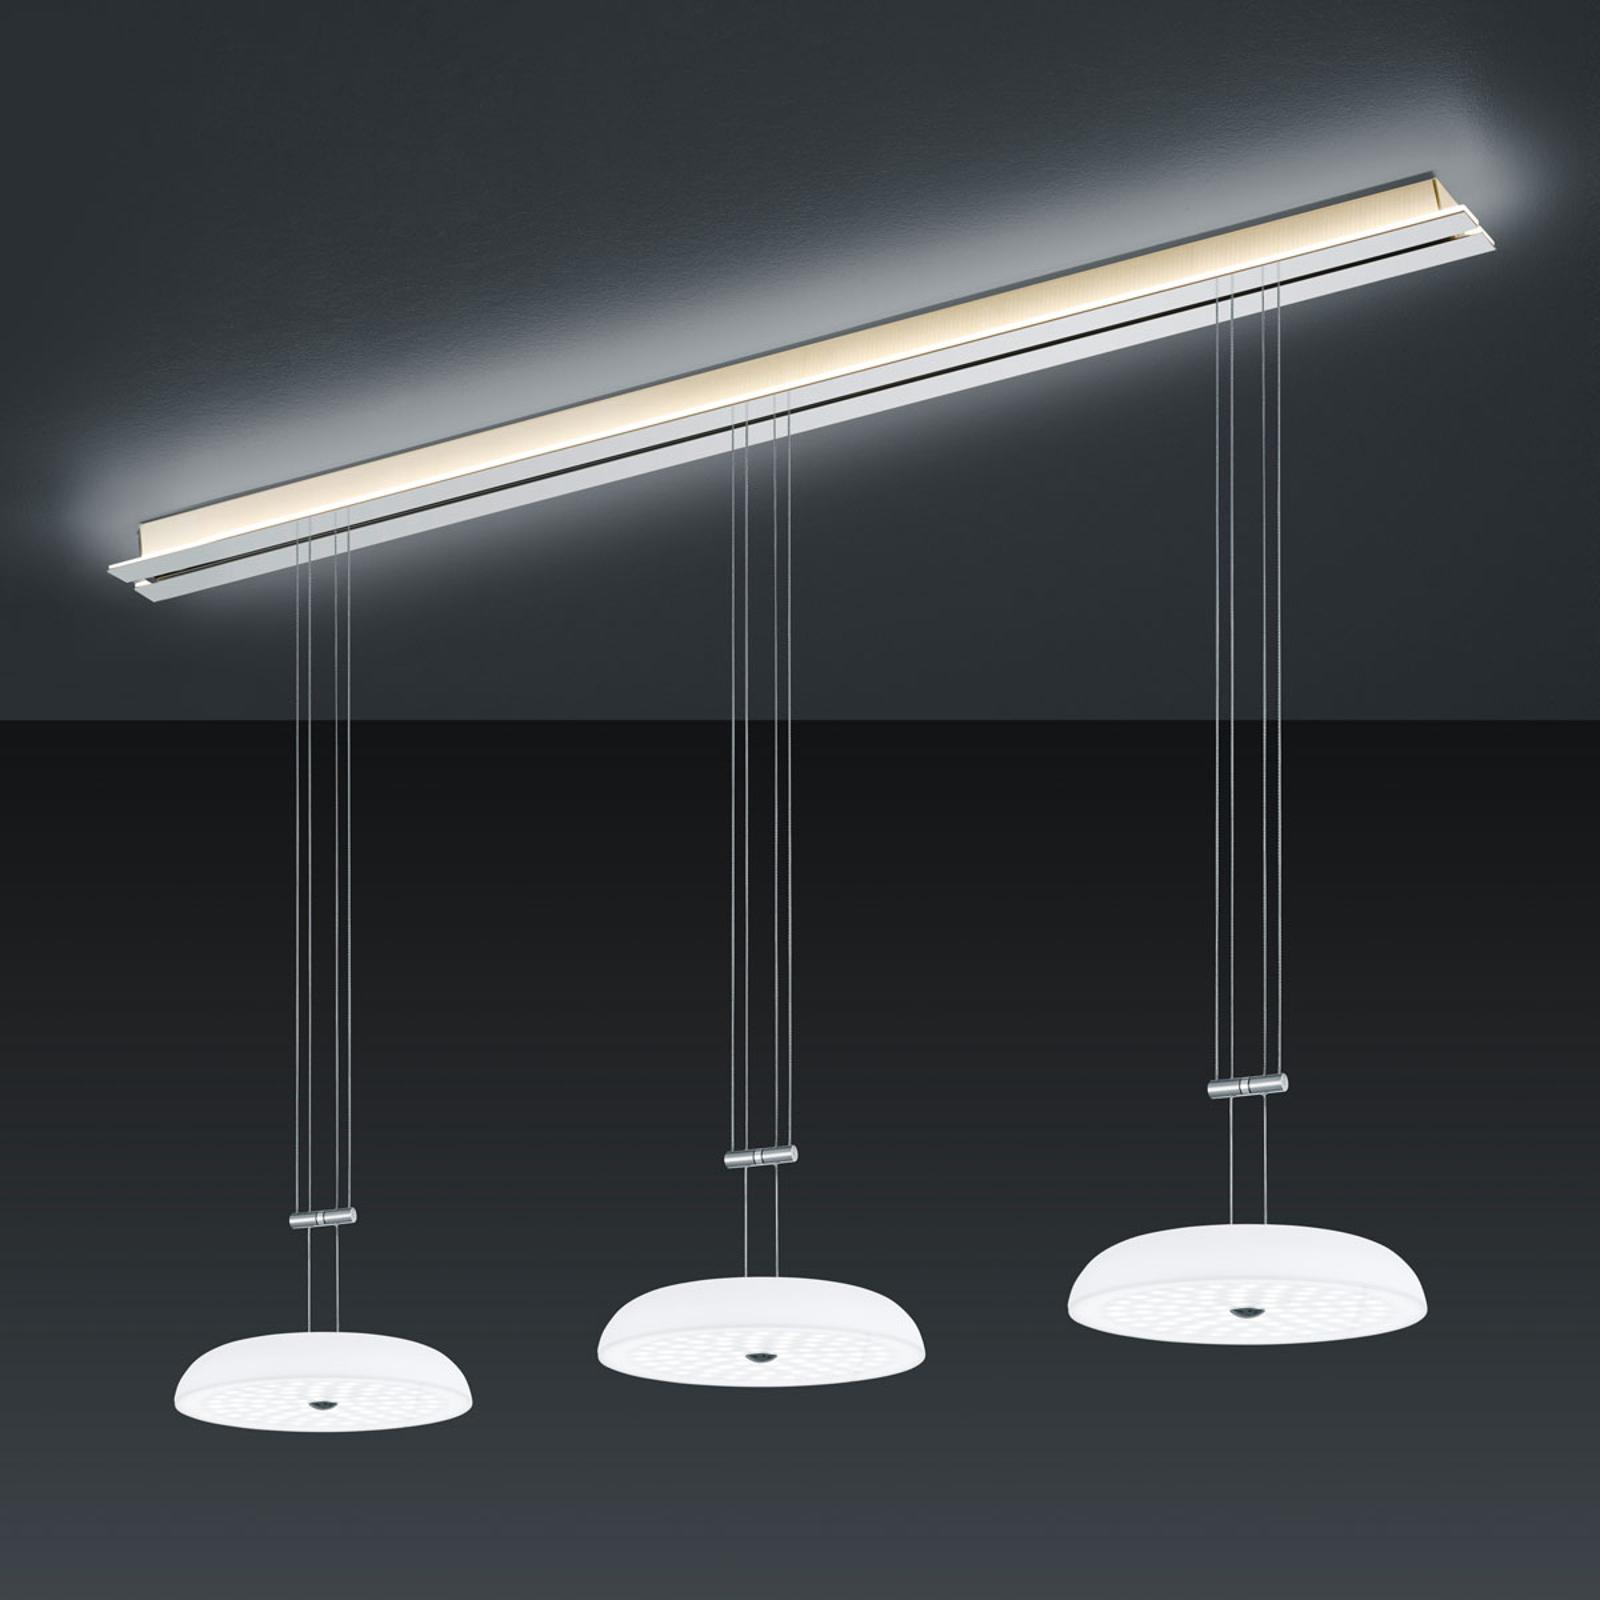 BANKAMP Strada Vanity lampa wisząca 3-pkt. 155 cm